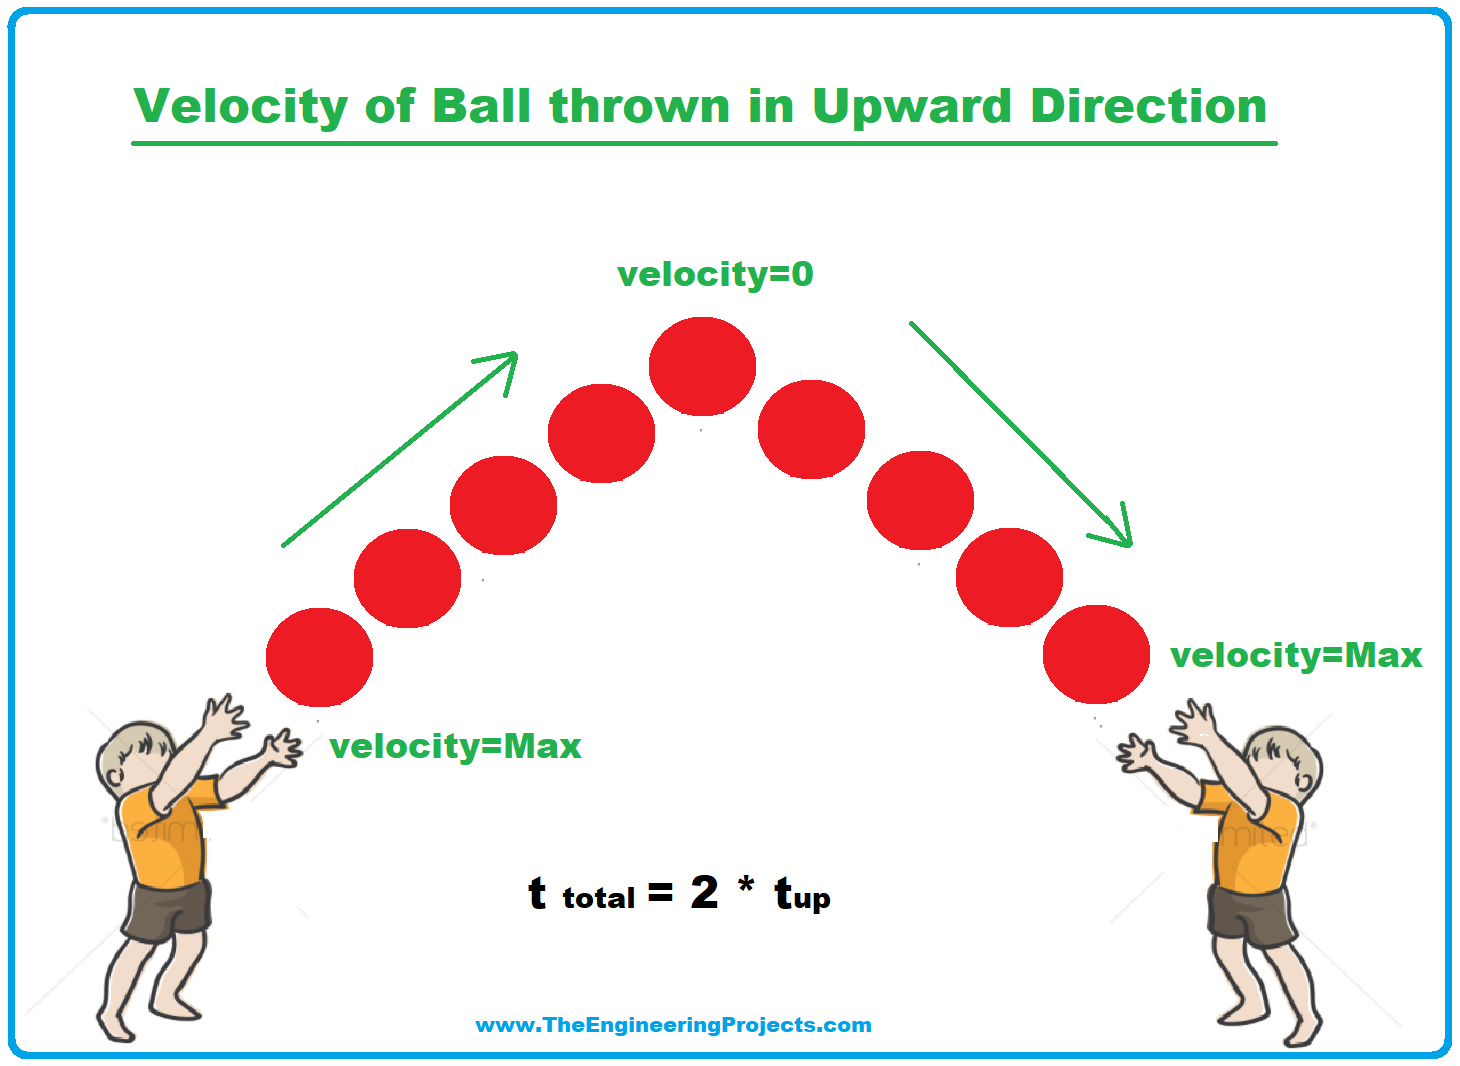 velocity, what is velocity, velocity of a ball, ball velocity, ball thrown upward velocity, calculate velocity